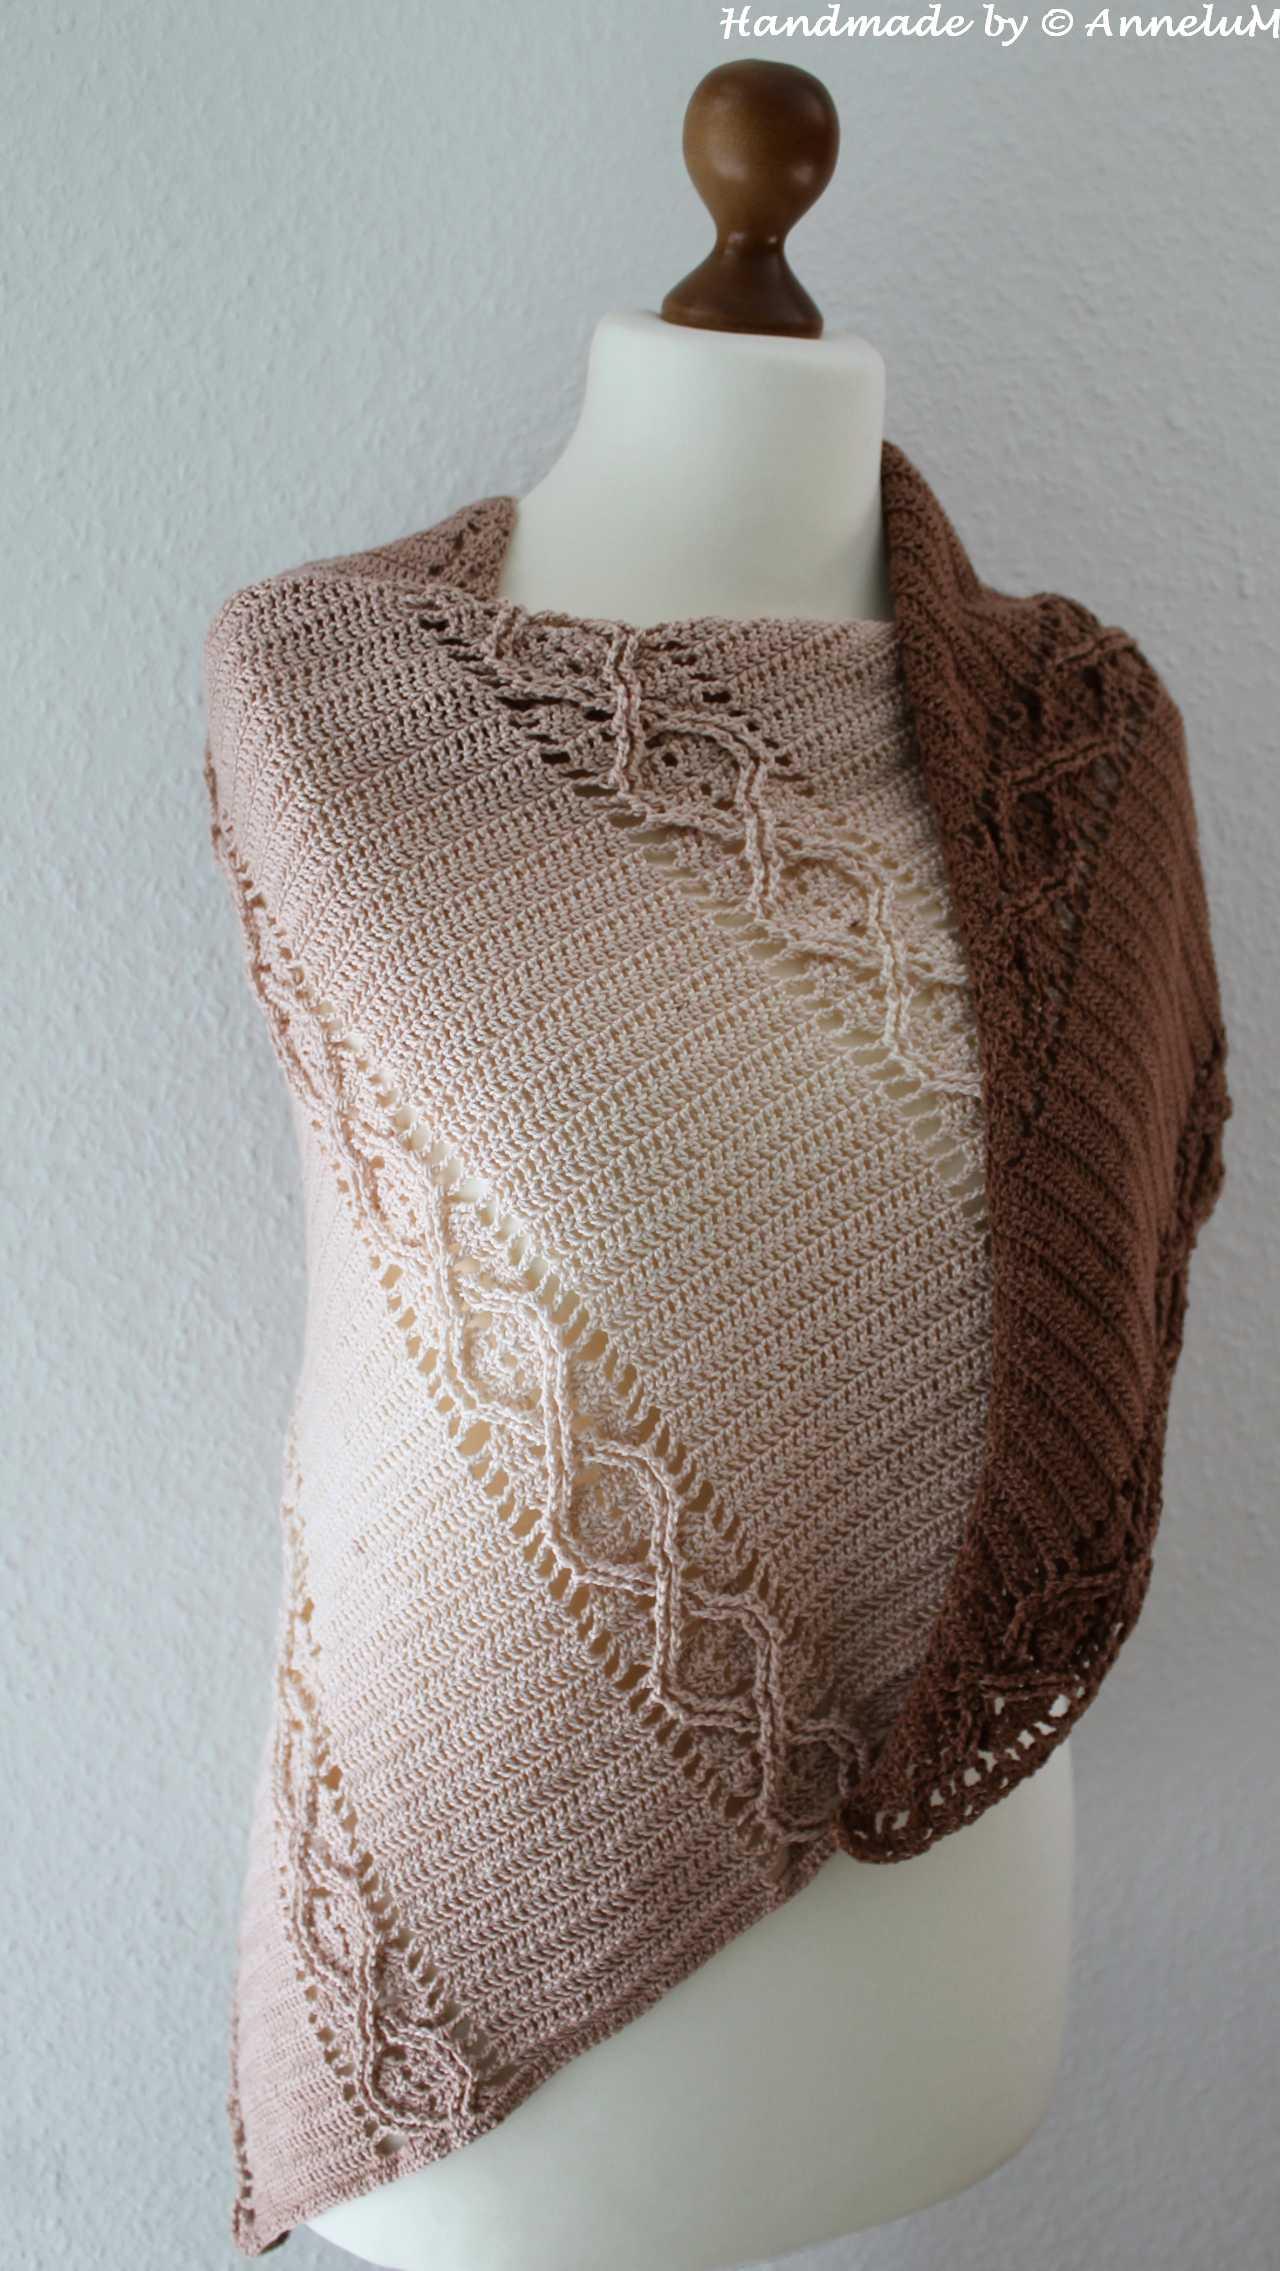 Lunaria - Handmade by AnneluM